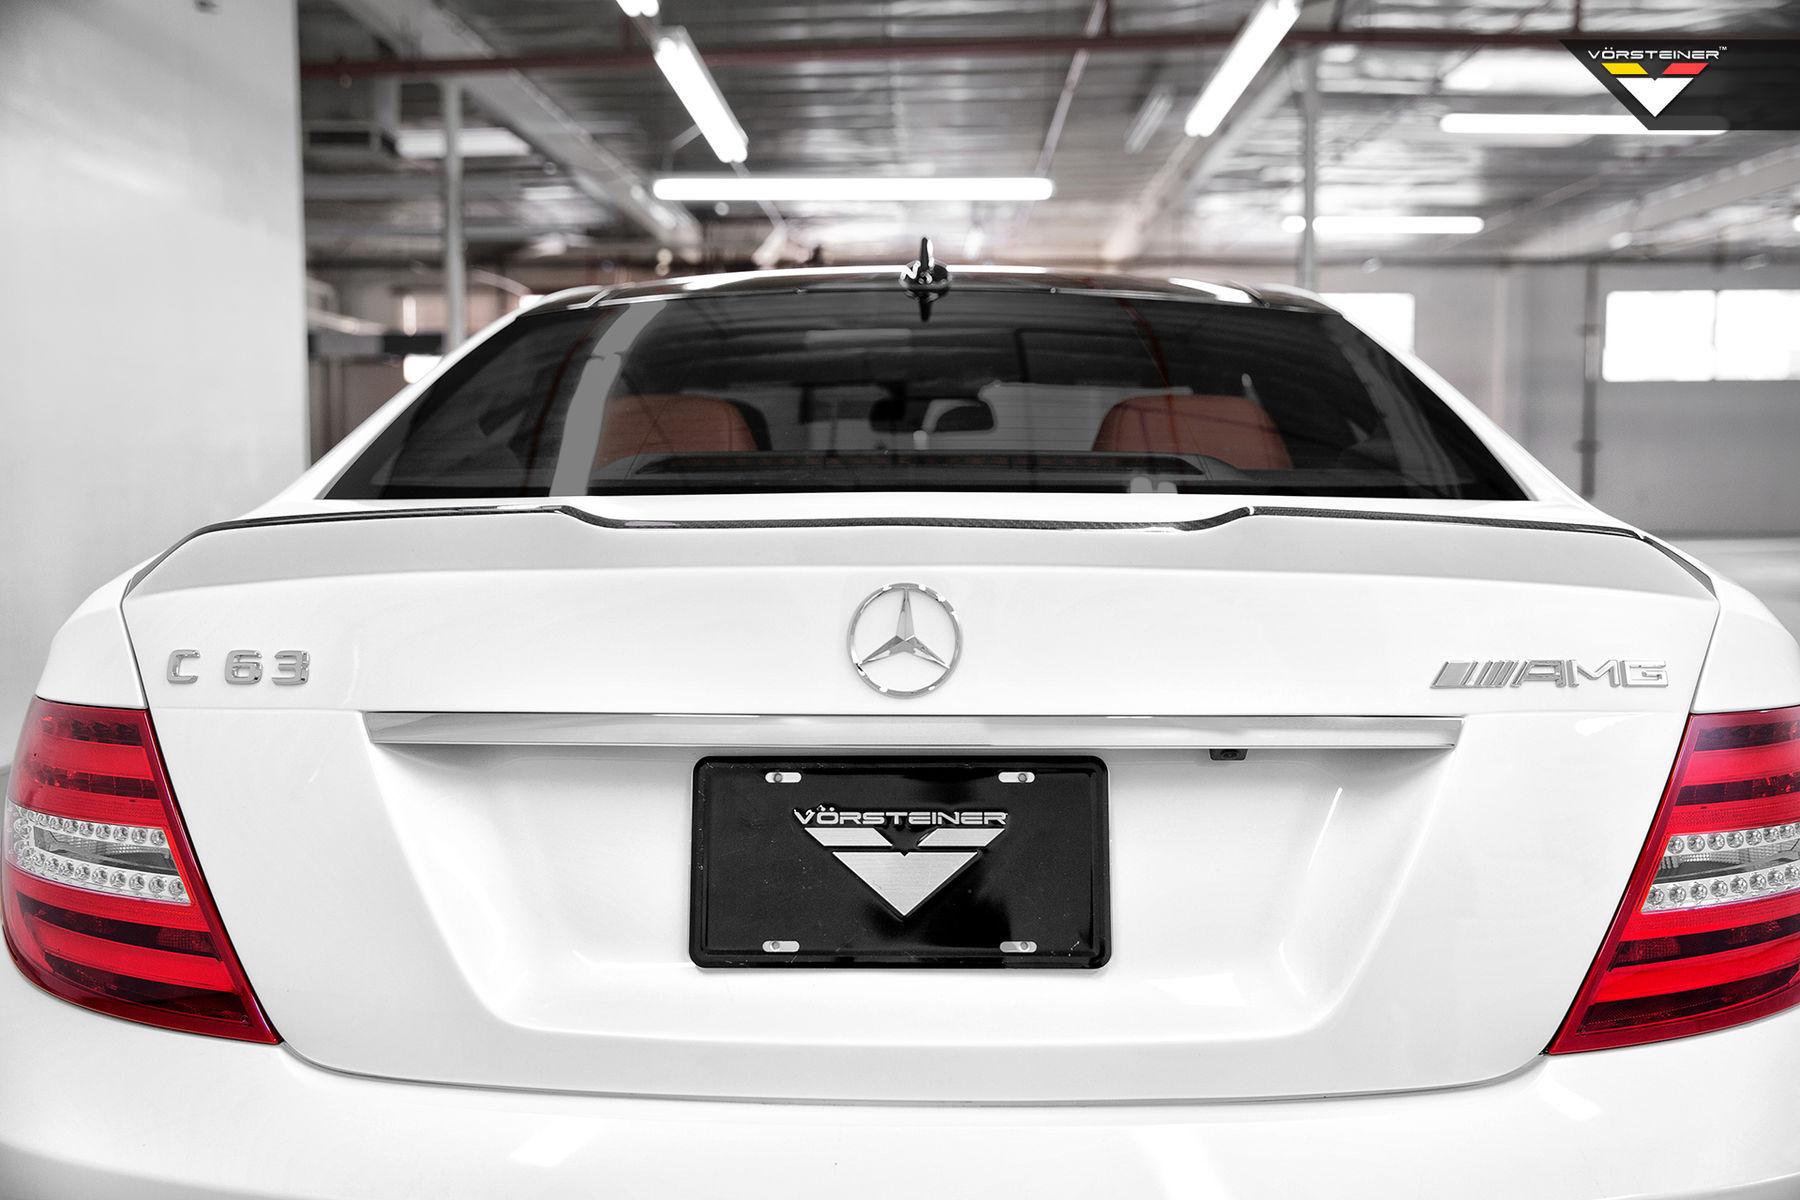 2013 Mercedes-Benz C63 AMG | Mercedes W204 C63 AMG COUPE